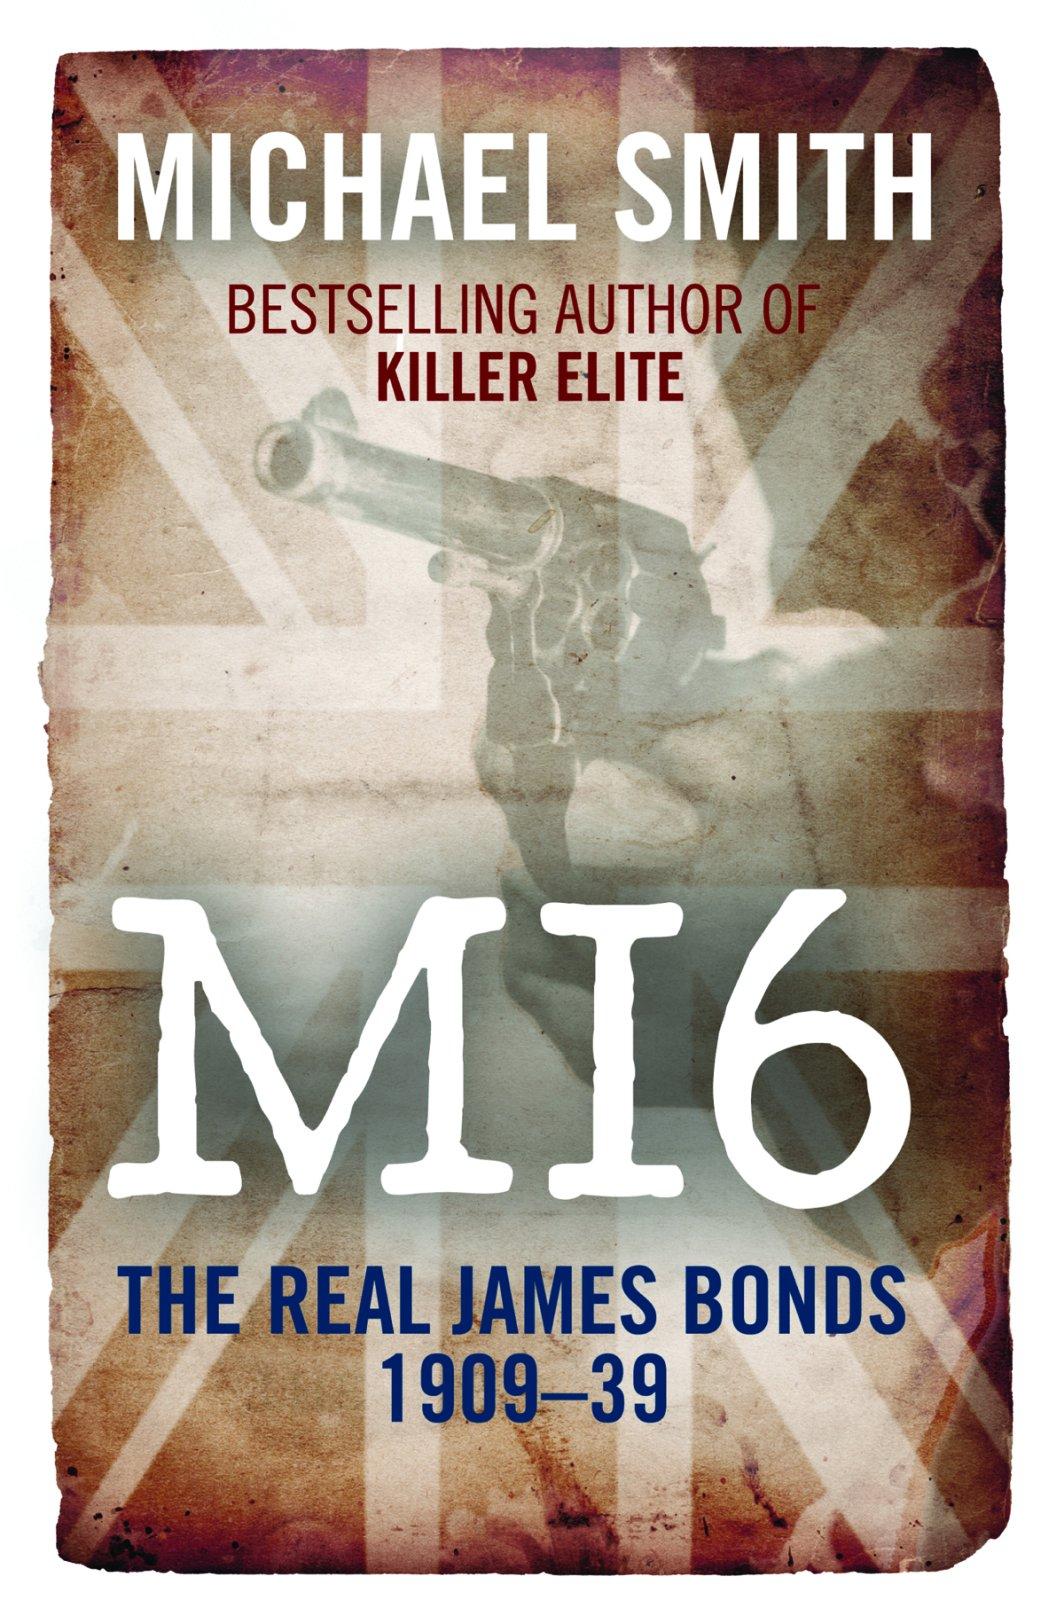 Six: The Real James Bonds 1909-1939